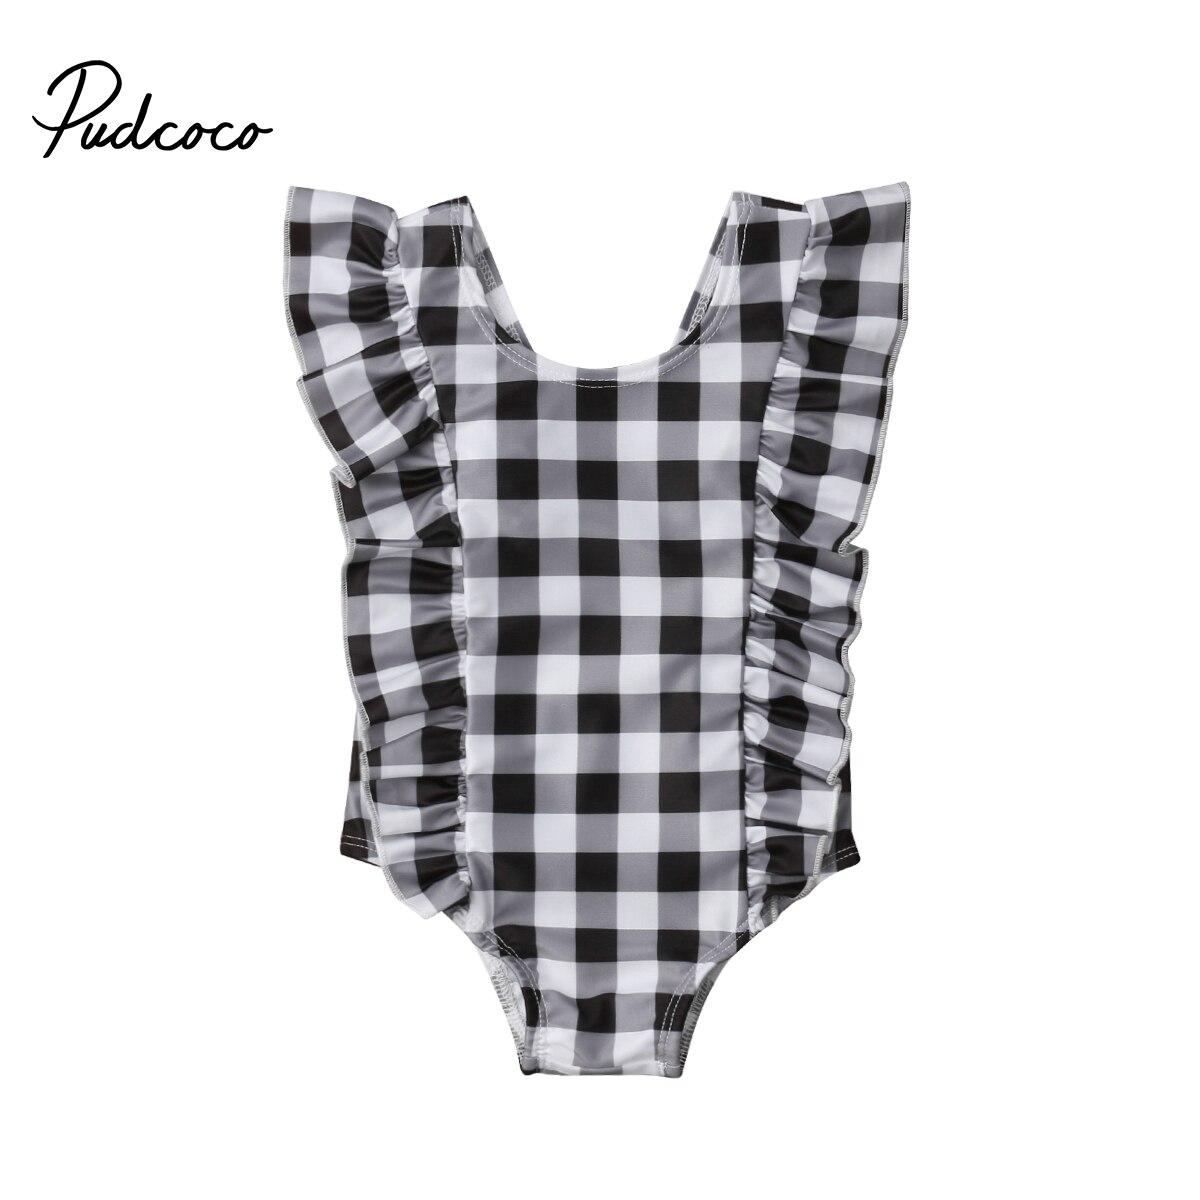 0-24M Newborns Baby Girls Swimsuit Surf Suit Kids Swimwear Infant Baby Girl Ruffle Plaid Jumpsuit Summer Beach Bathing Suit